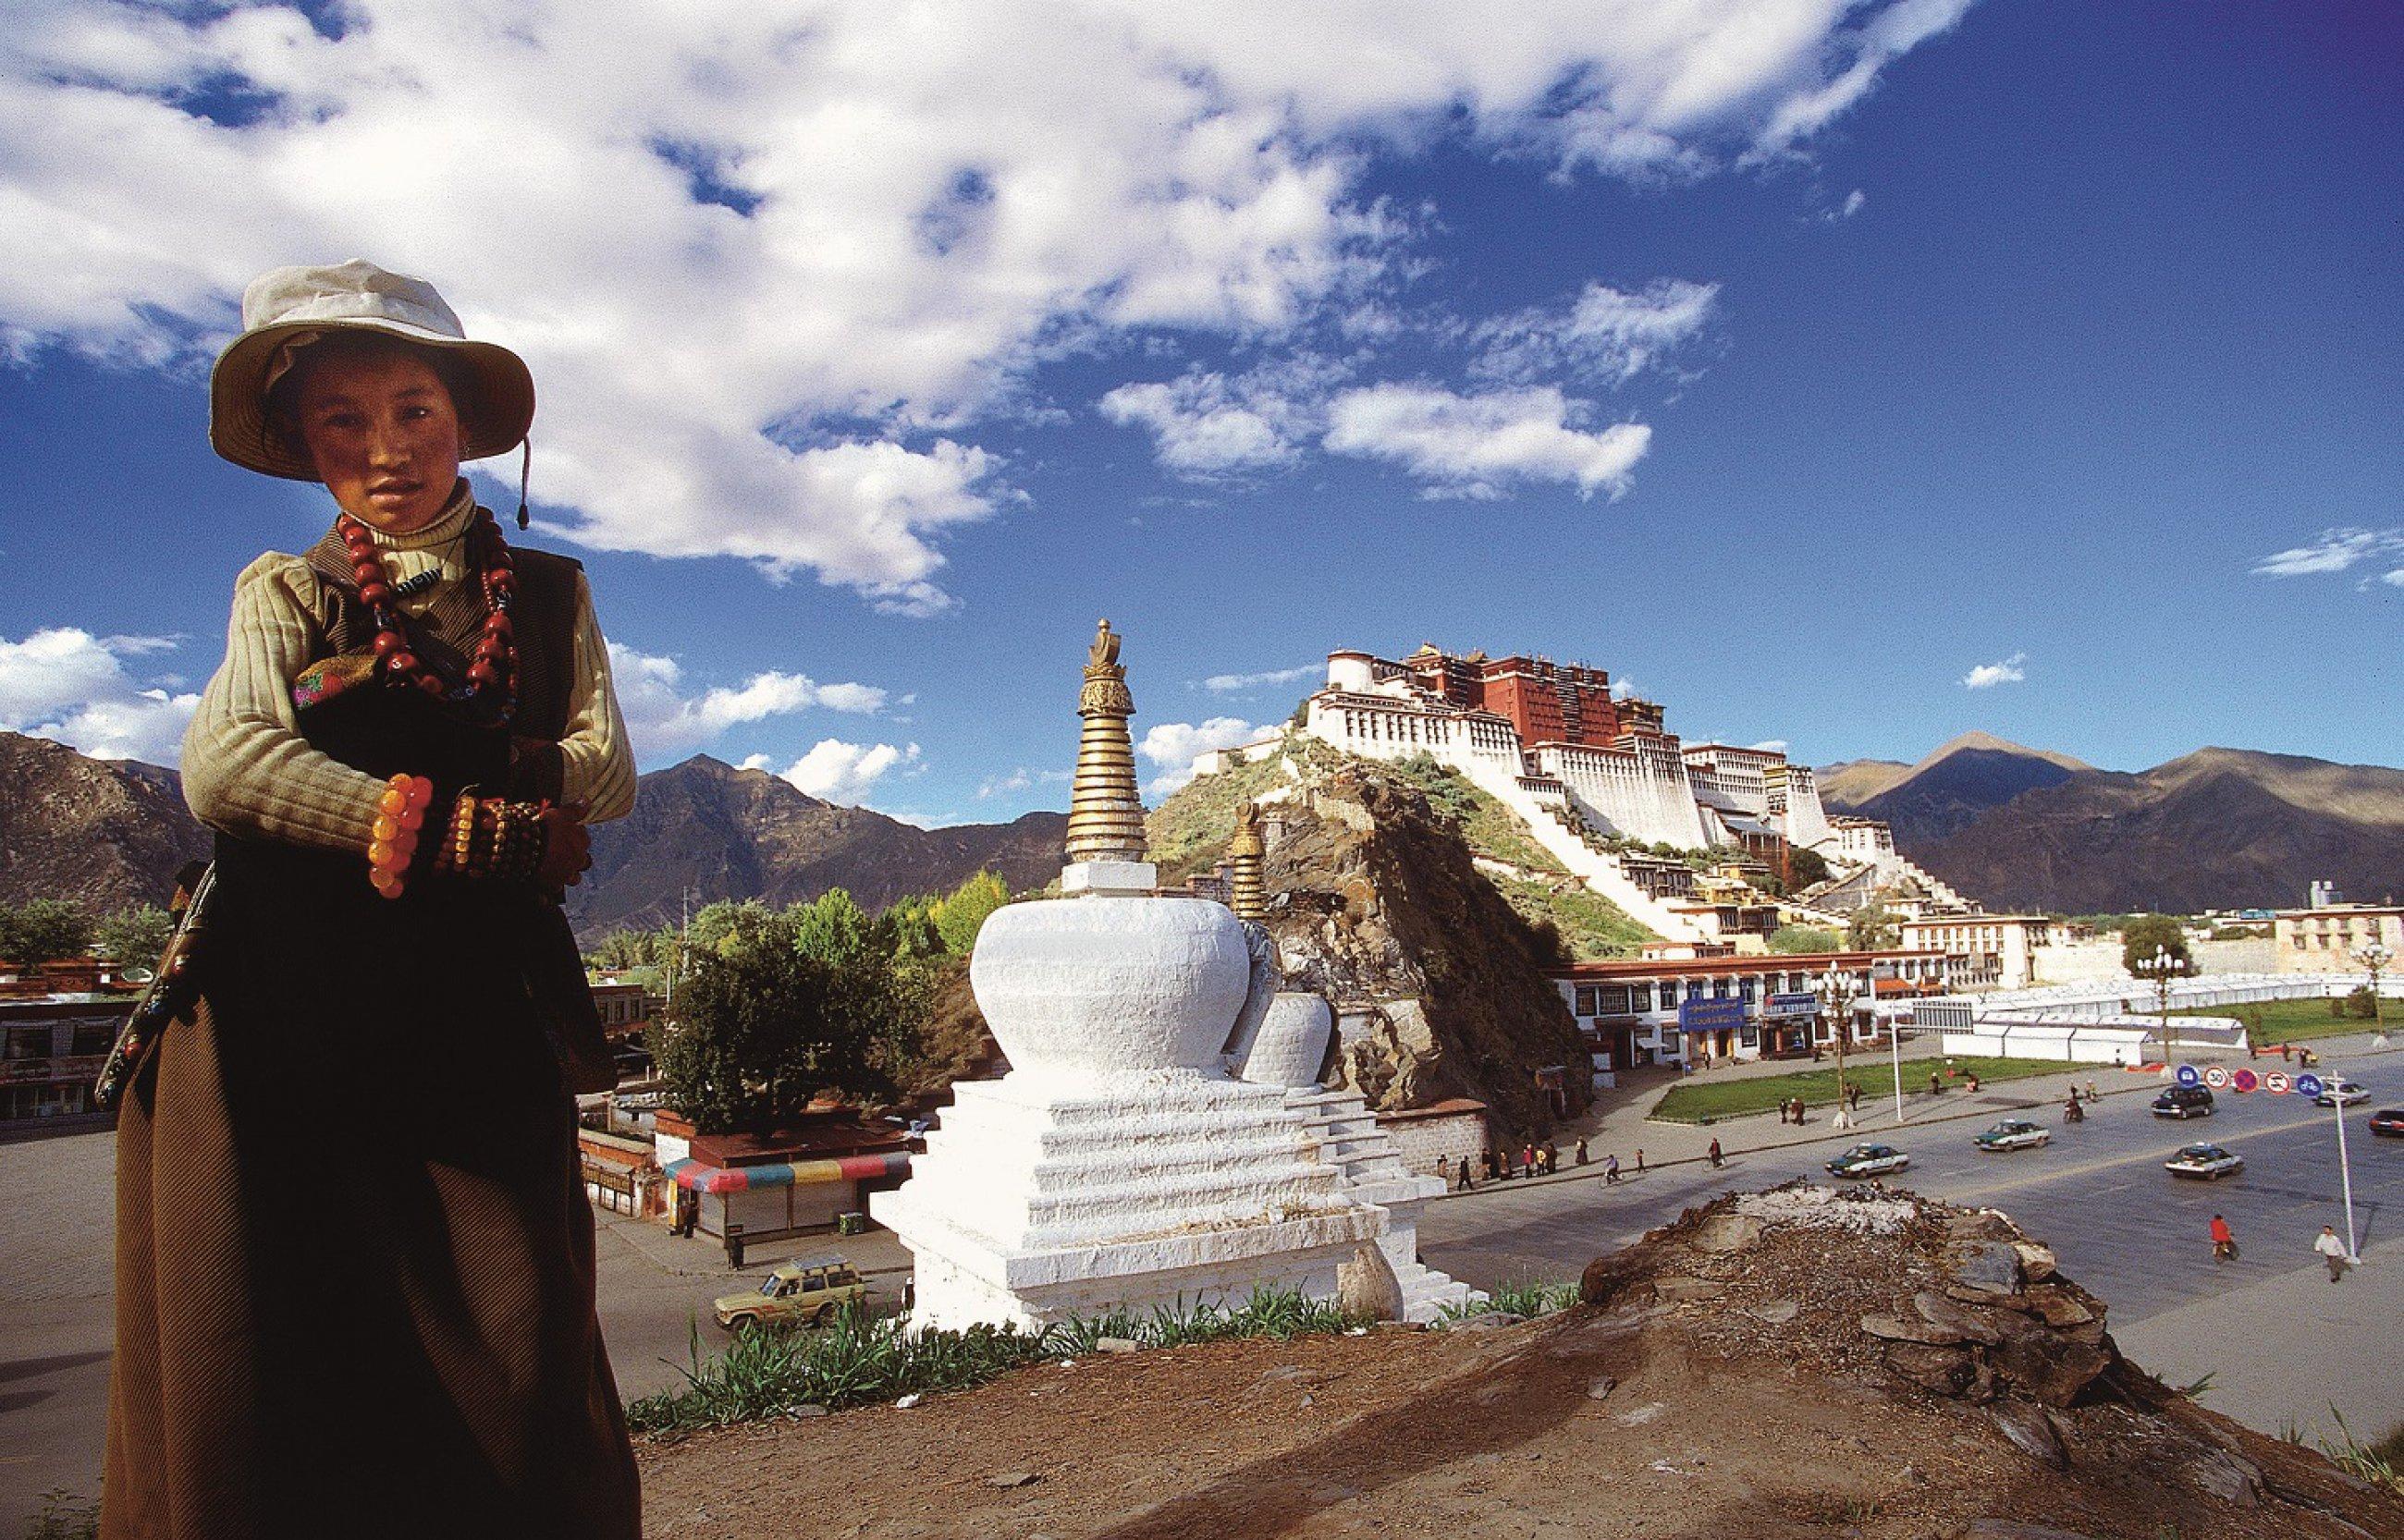 https://bubo.sk/uploads/galleries/3467/tibet-lhasa.jpg